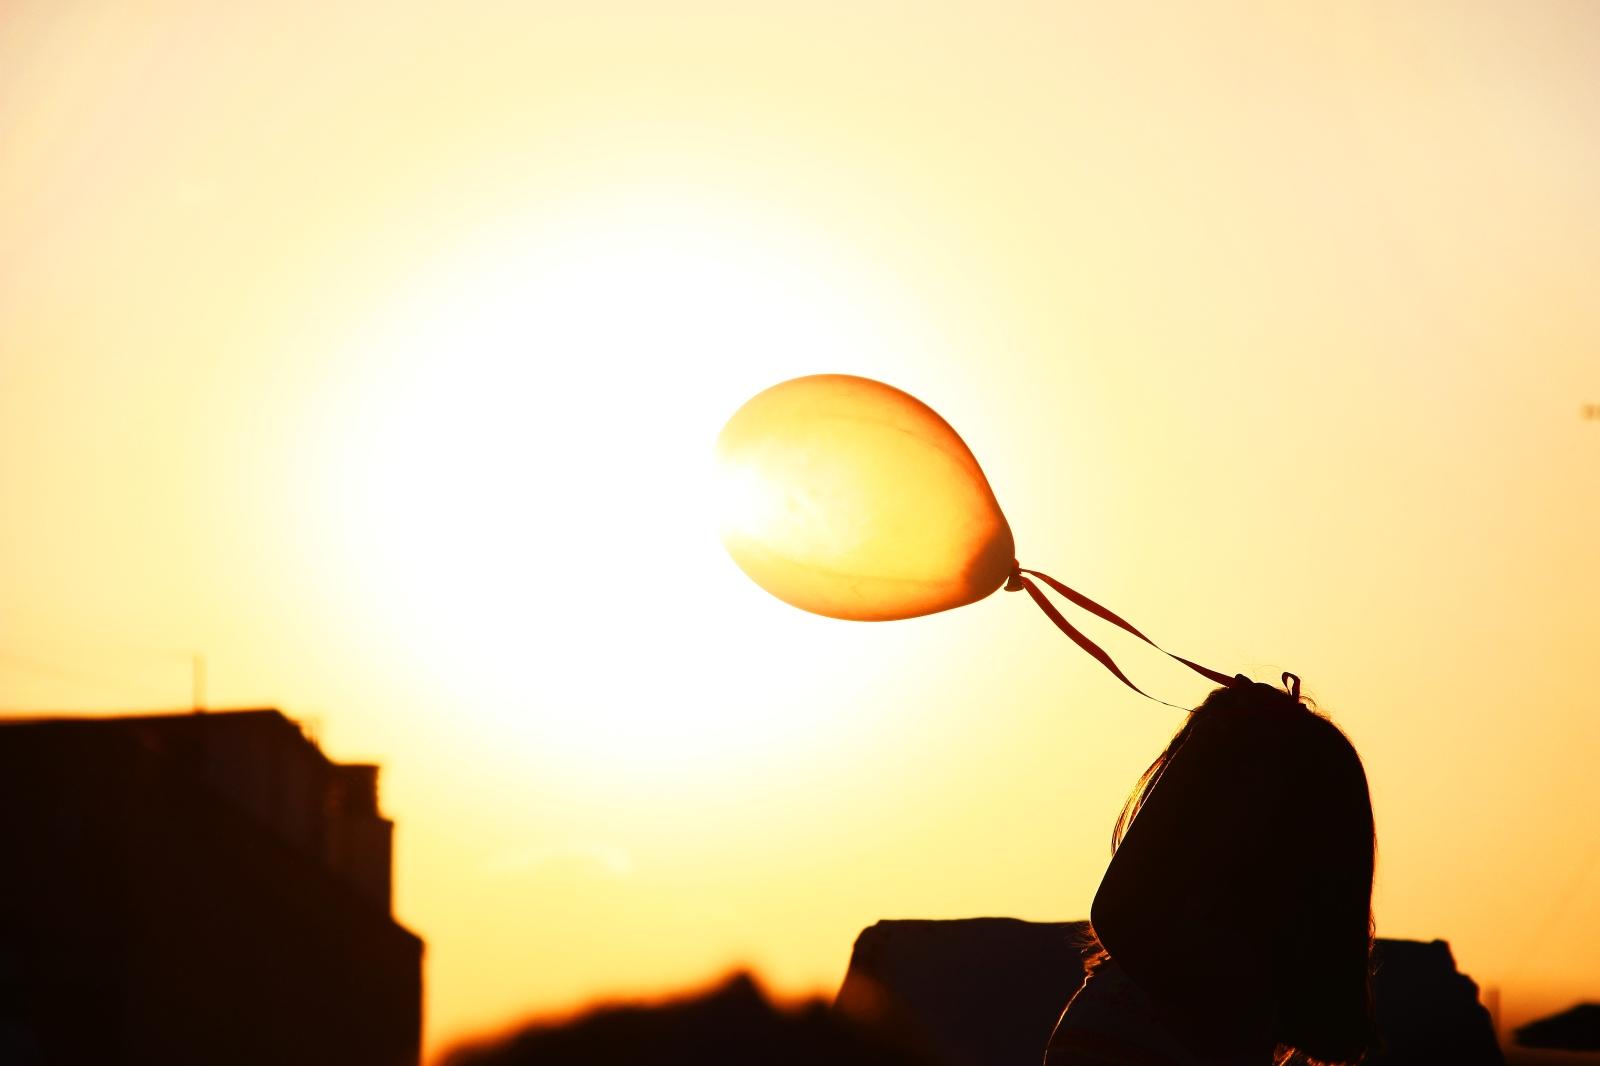 2015-02-Life-of-Pix-free-stock-photos-sky-girl-balloon-sun-bruno-ramos-lara